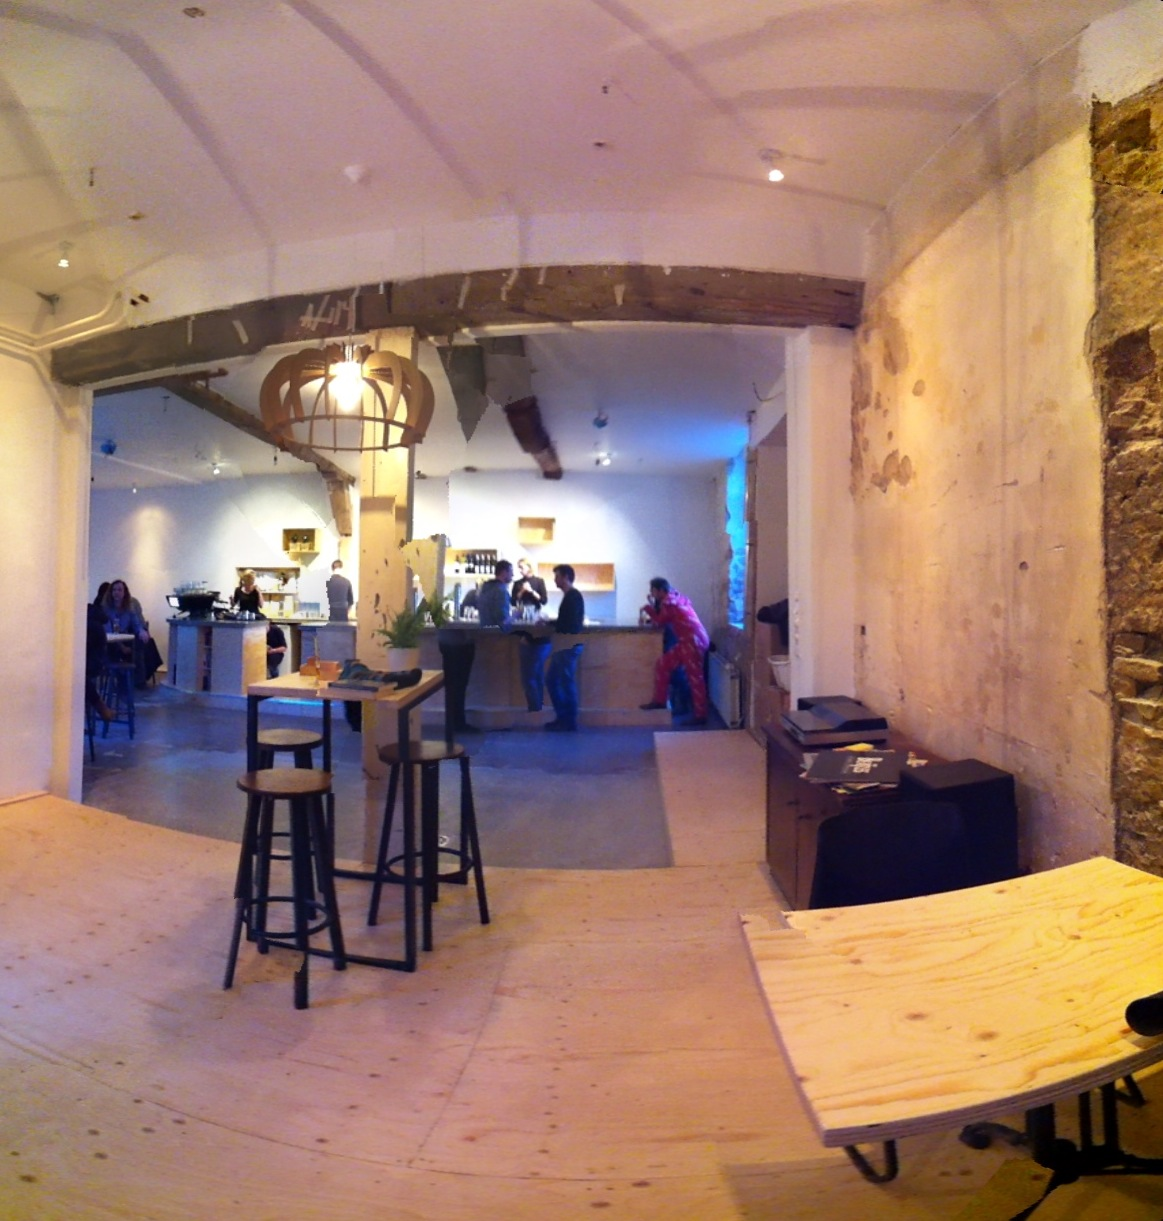 IndiePendants custom pendants at Barbaar Cafe and Makerspace, Netherlands